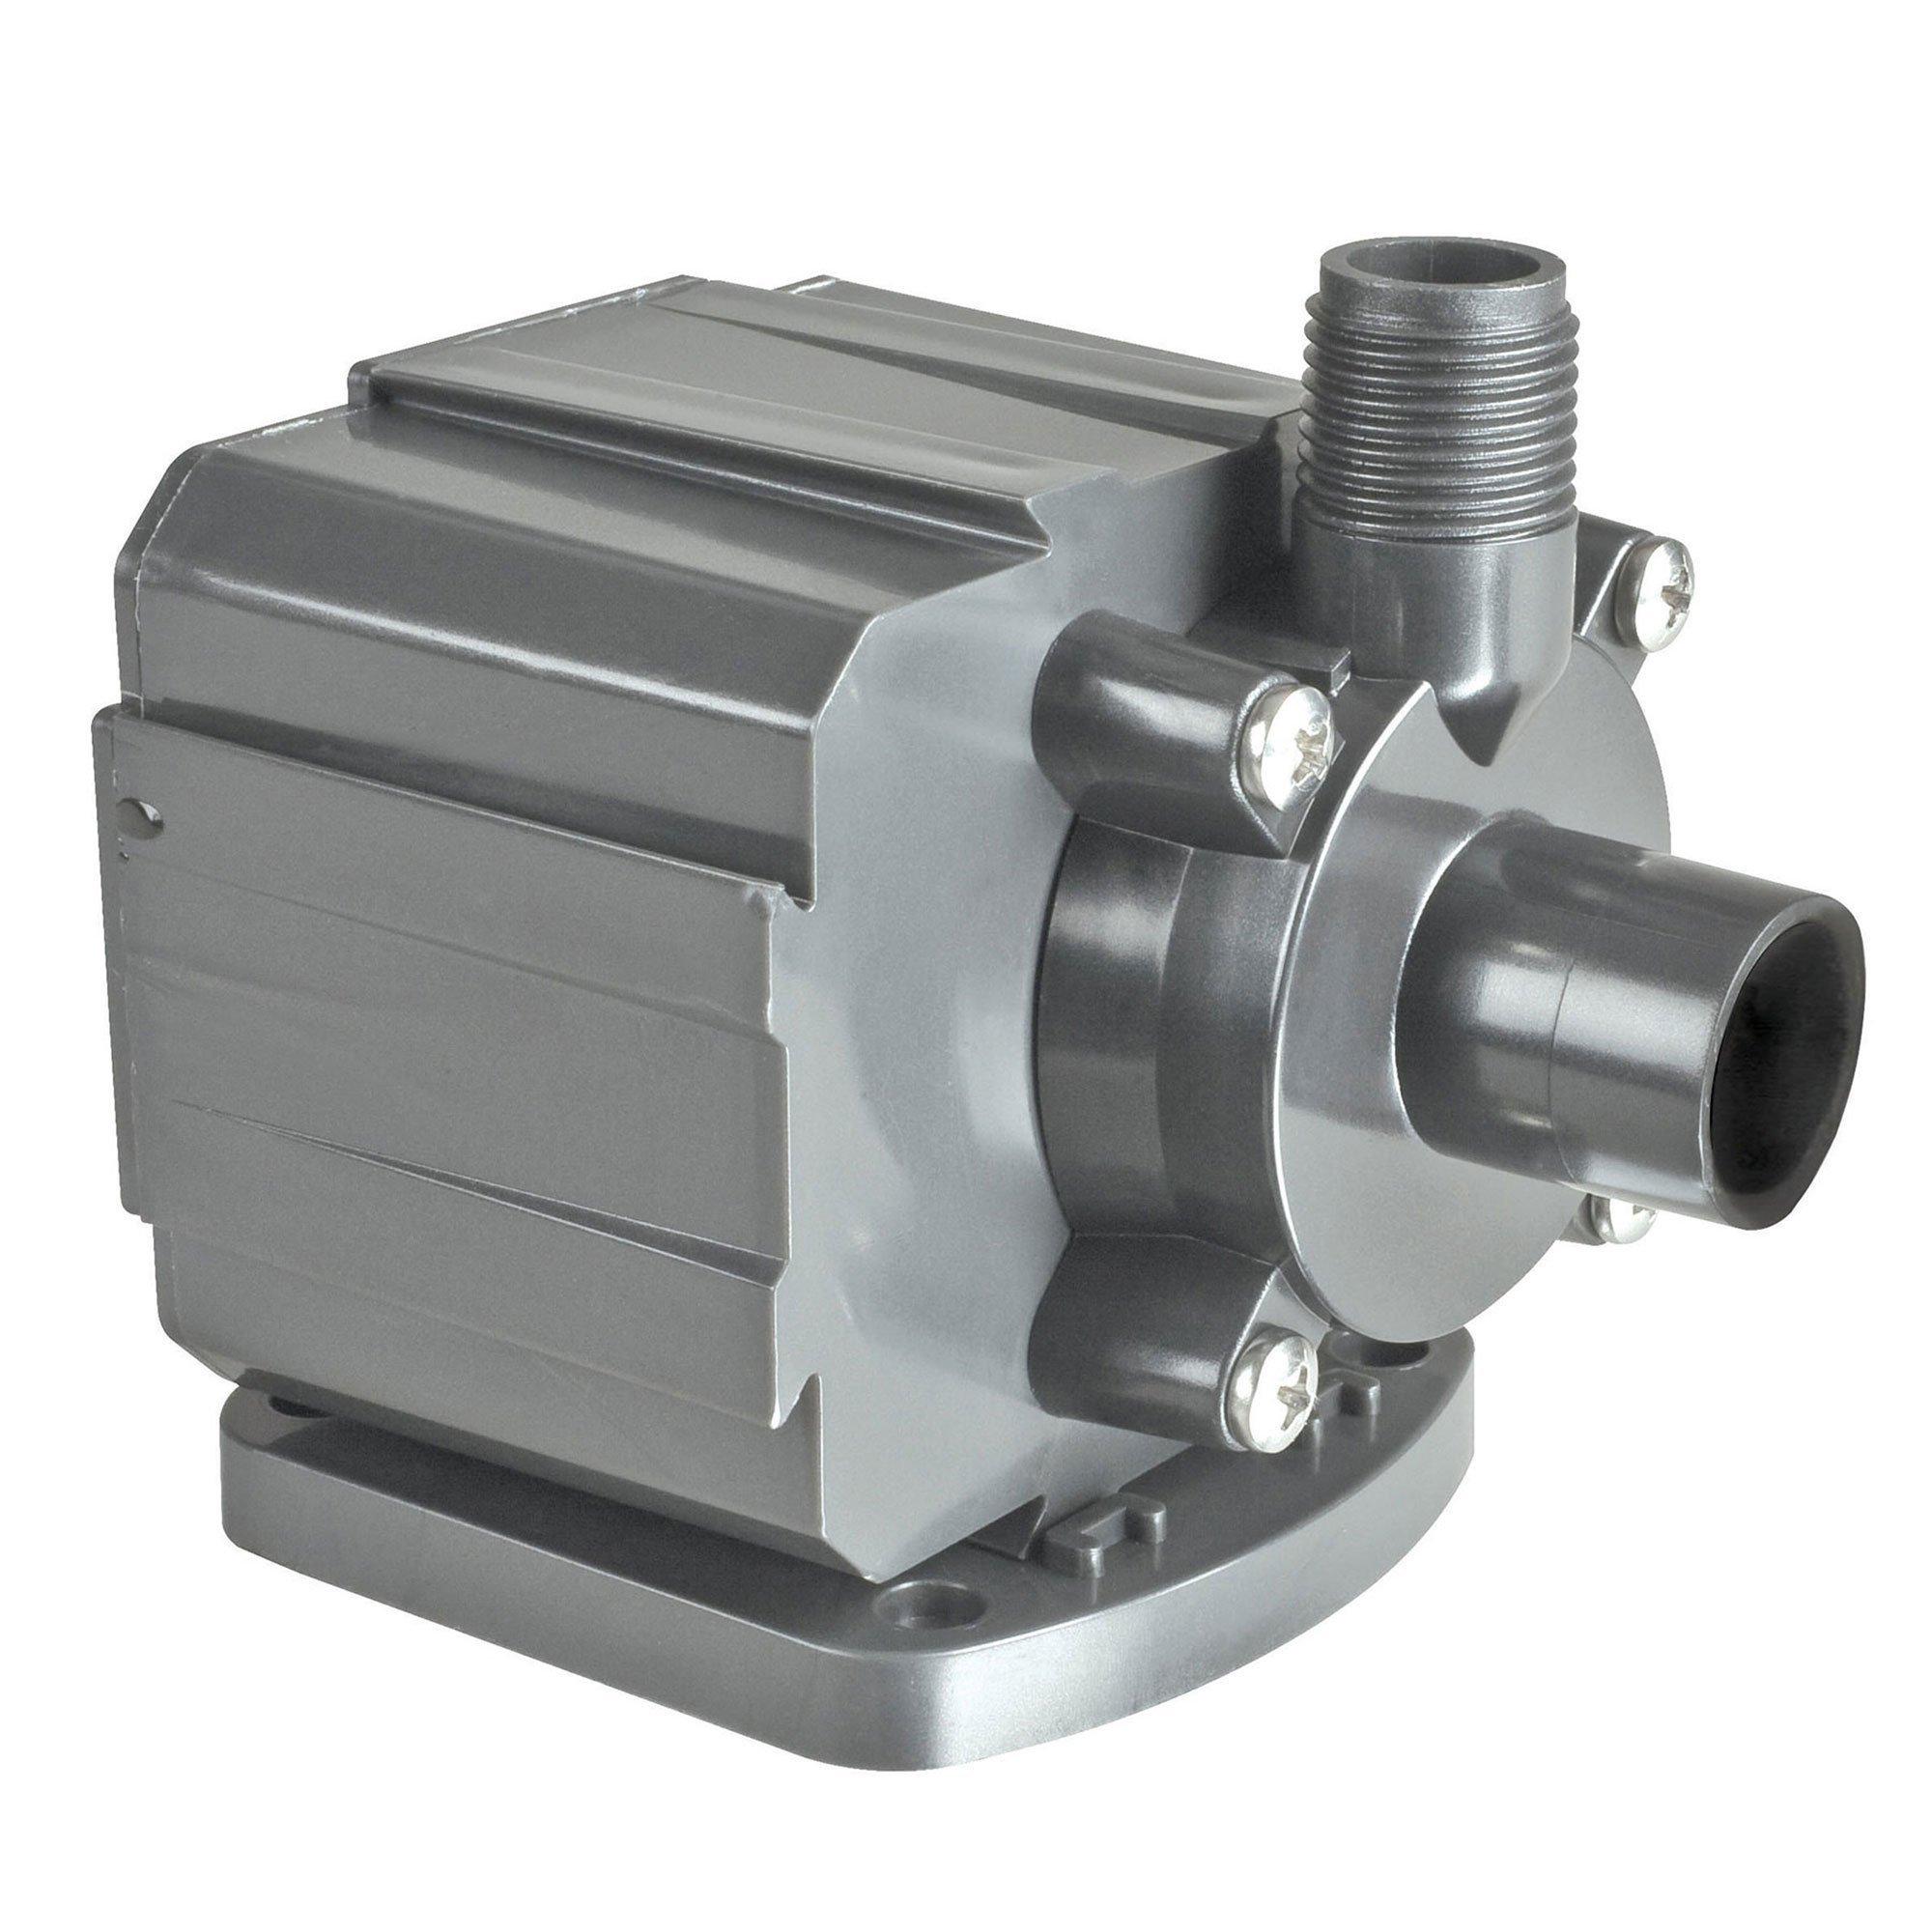 Pondmaster 02525 500 GPH Magnetic Drive Utility Pump